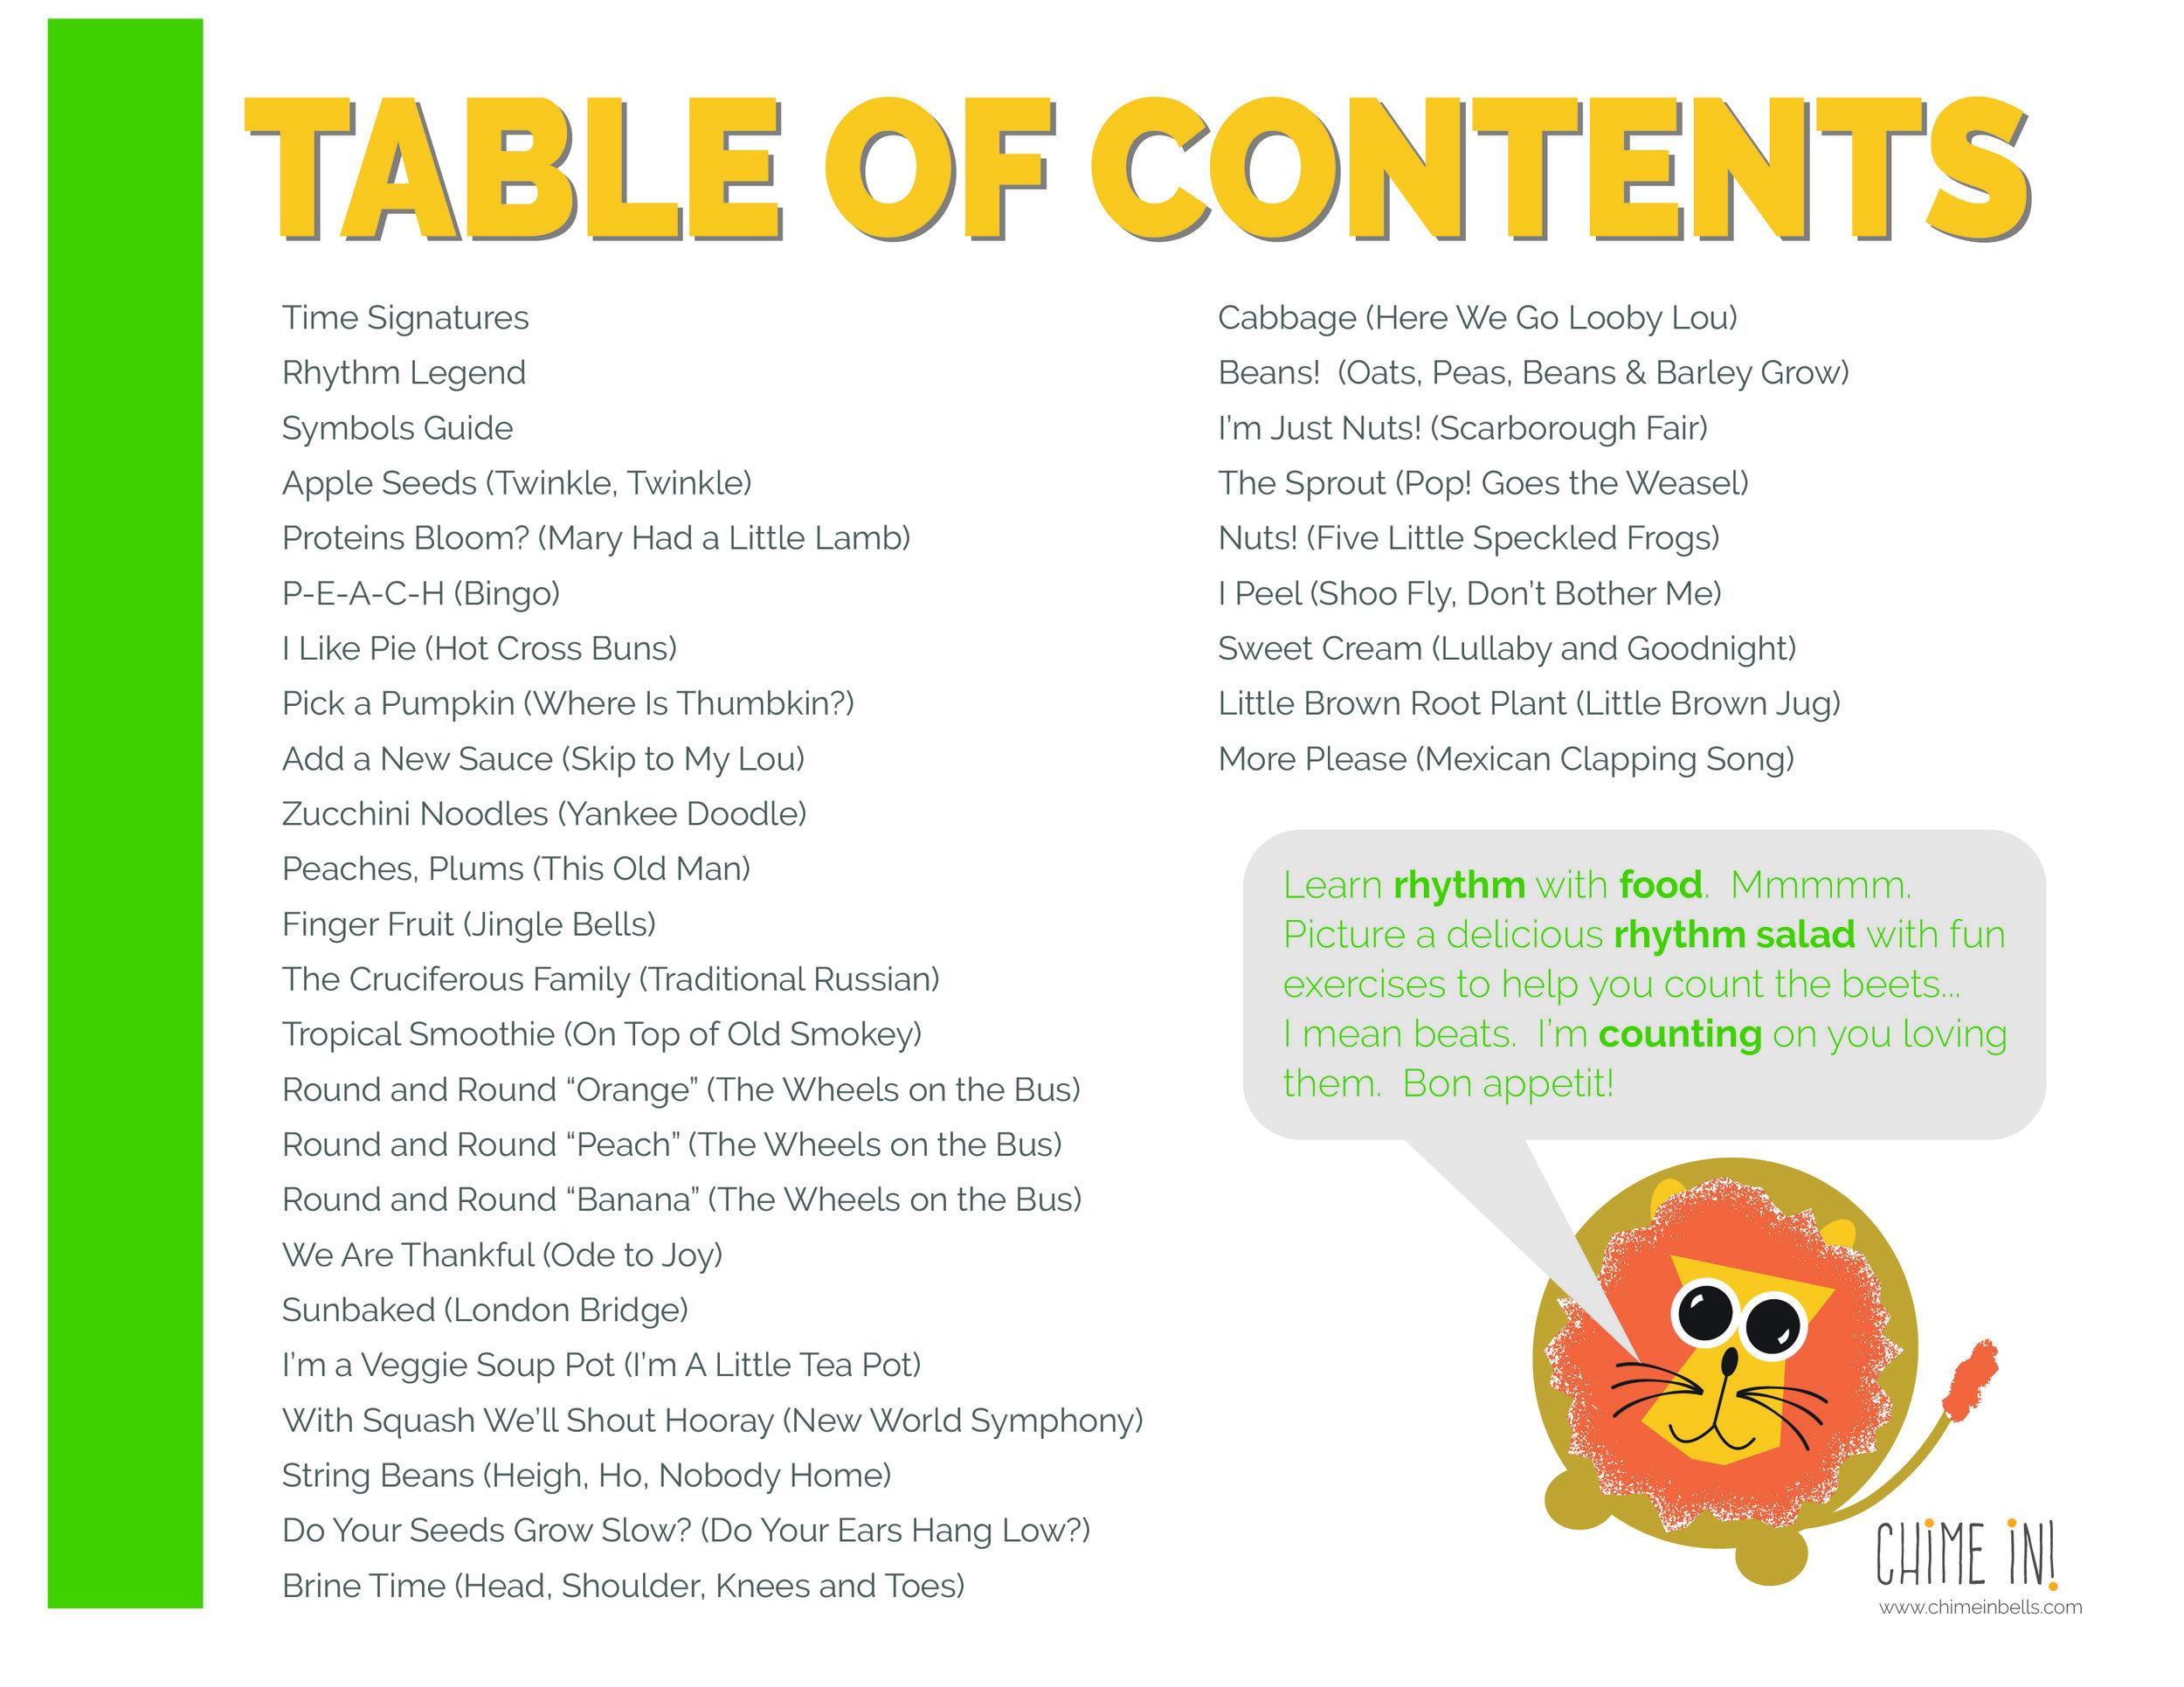 Rickman'sRhythmSalad_TimeSignaturesSpaced_Table of Contents.jpg